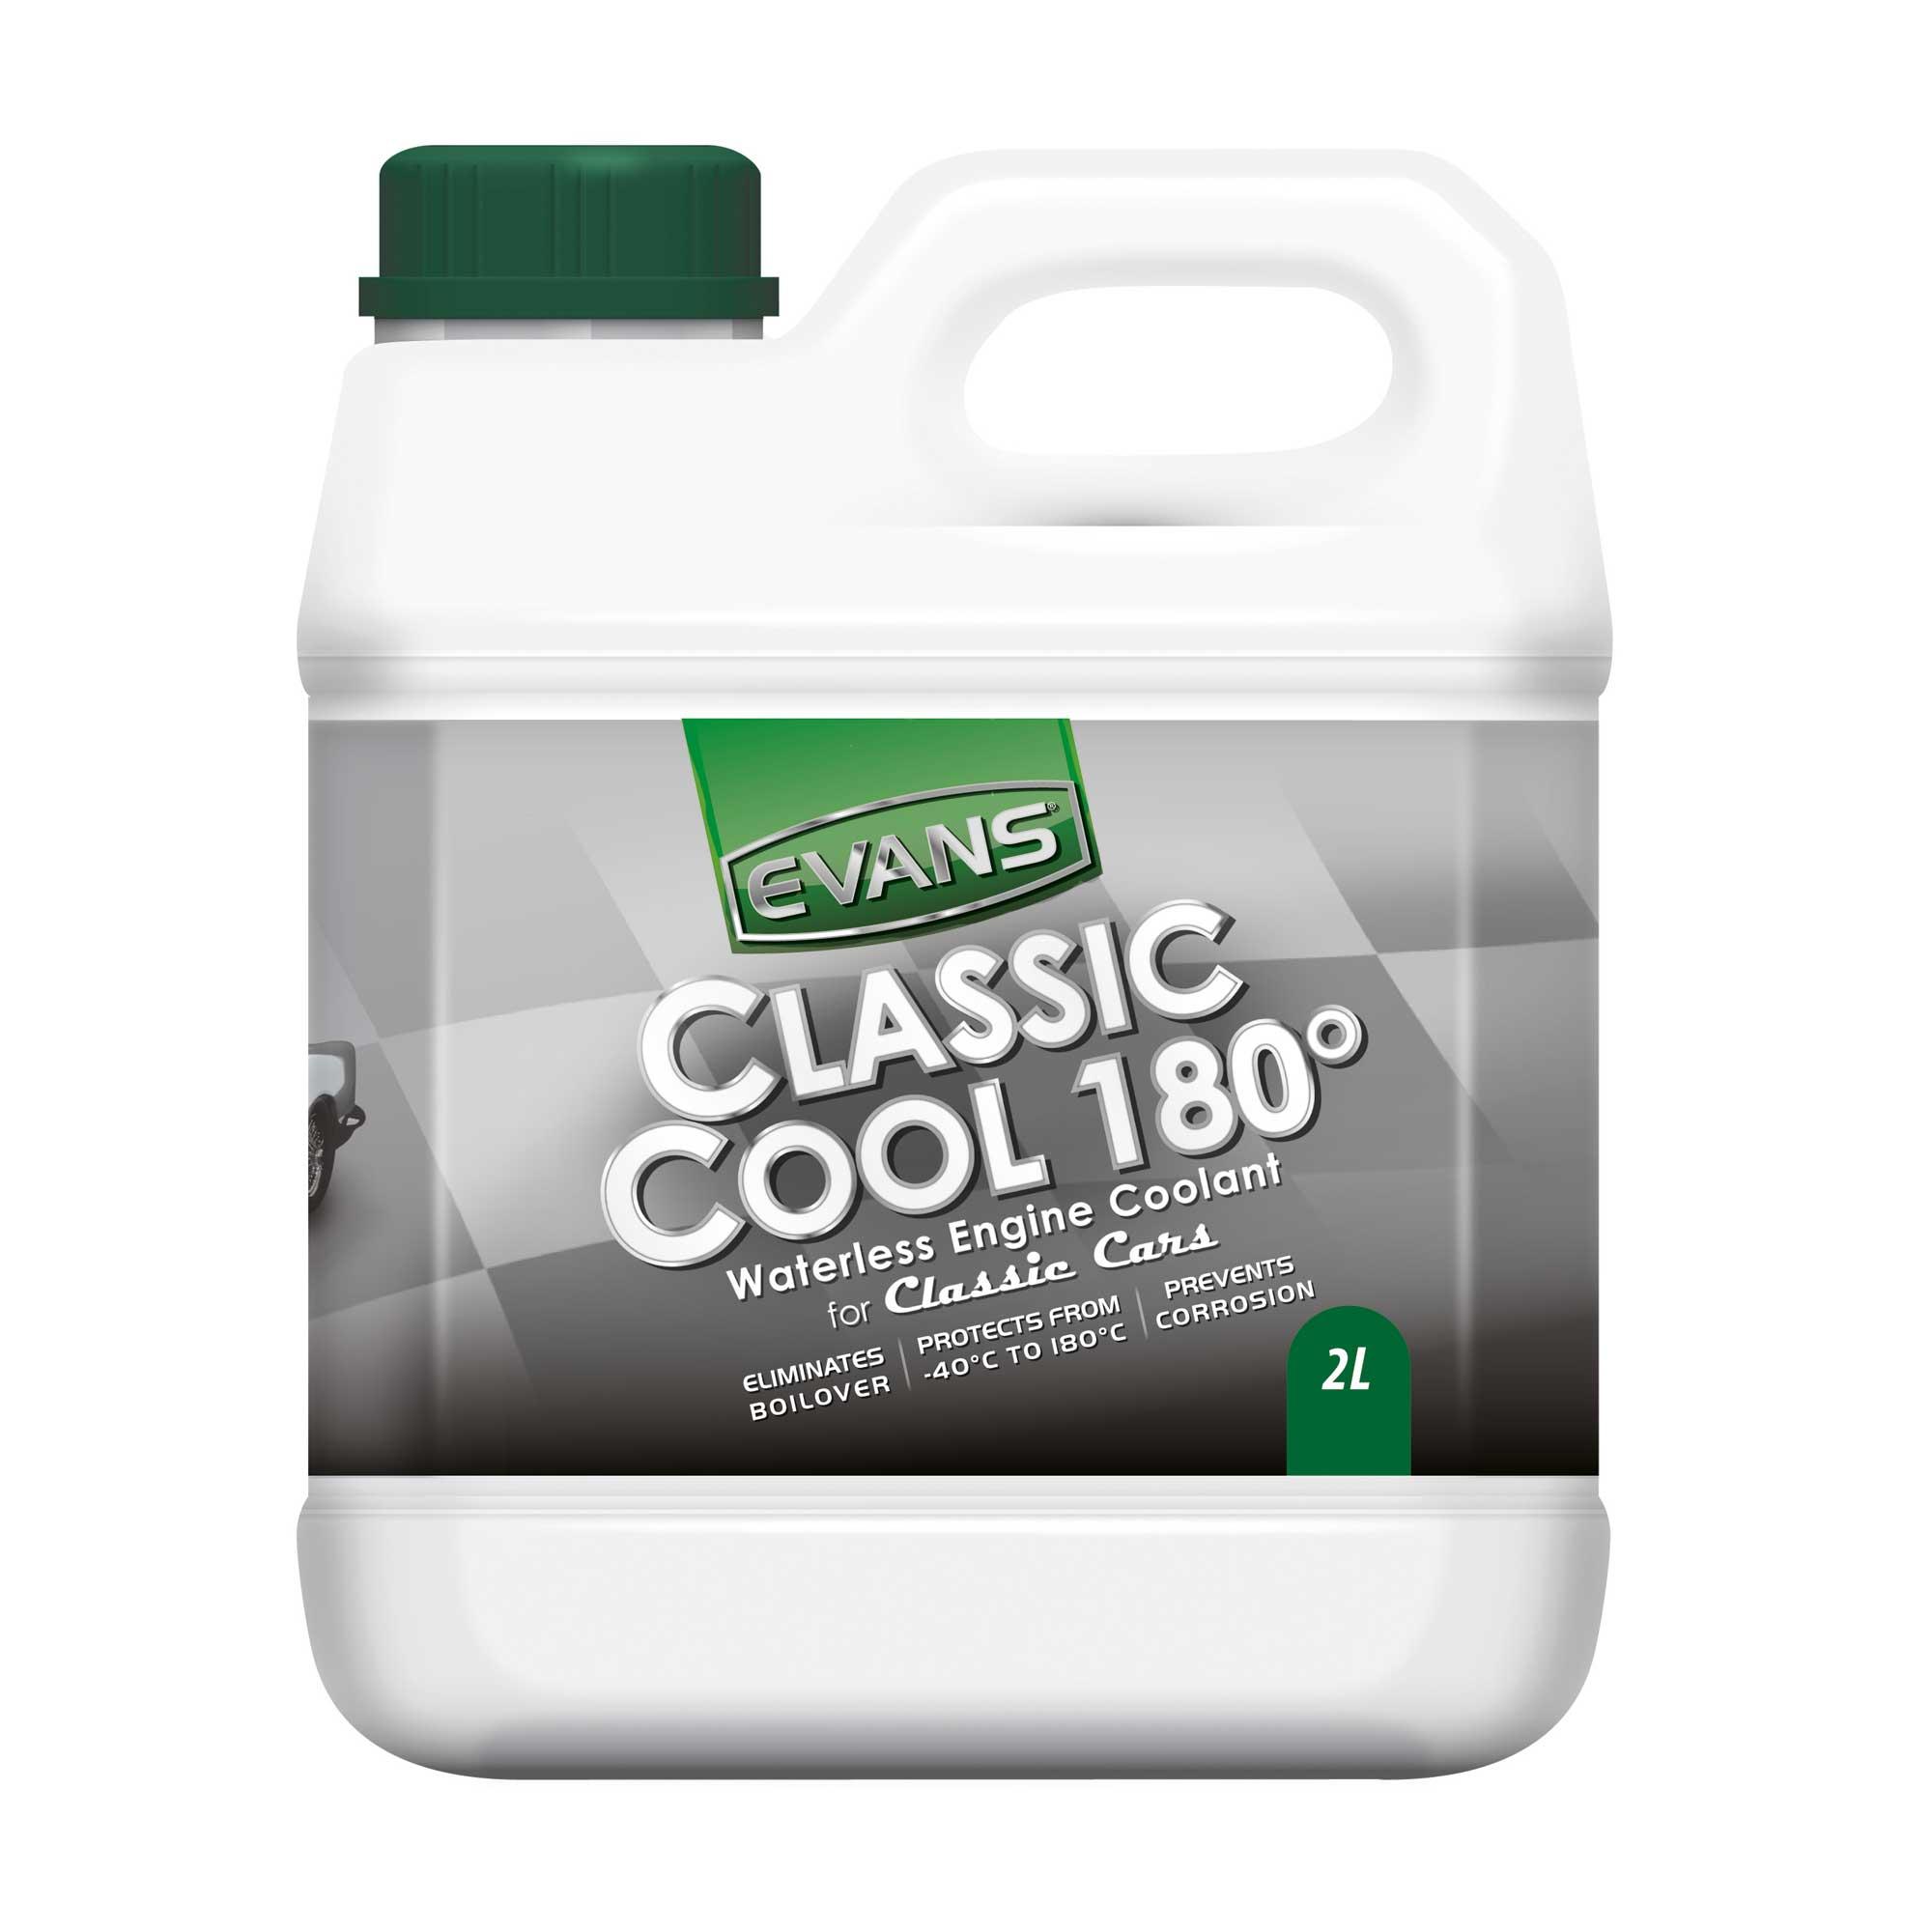 Evans Classic Cool 180 CC2-Evans